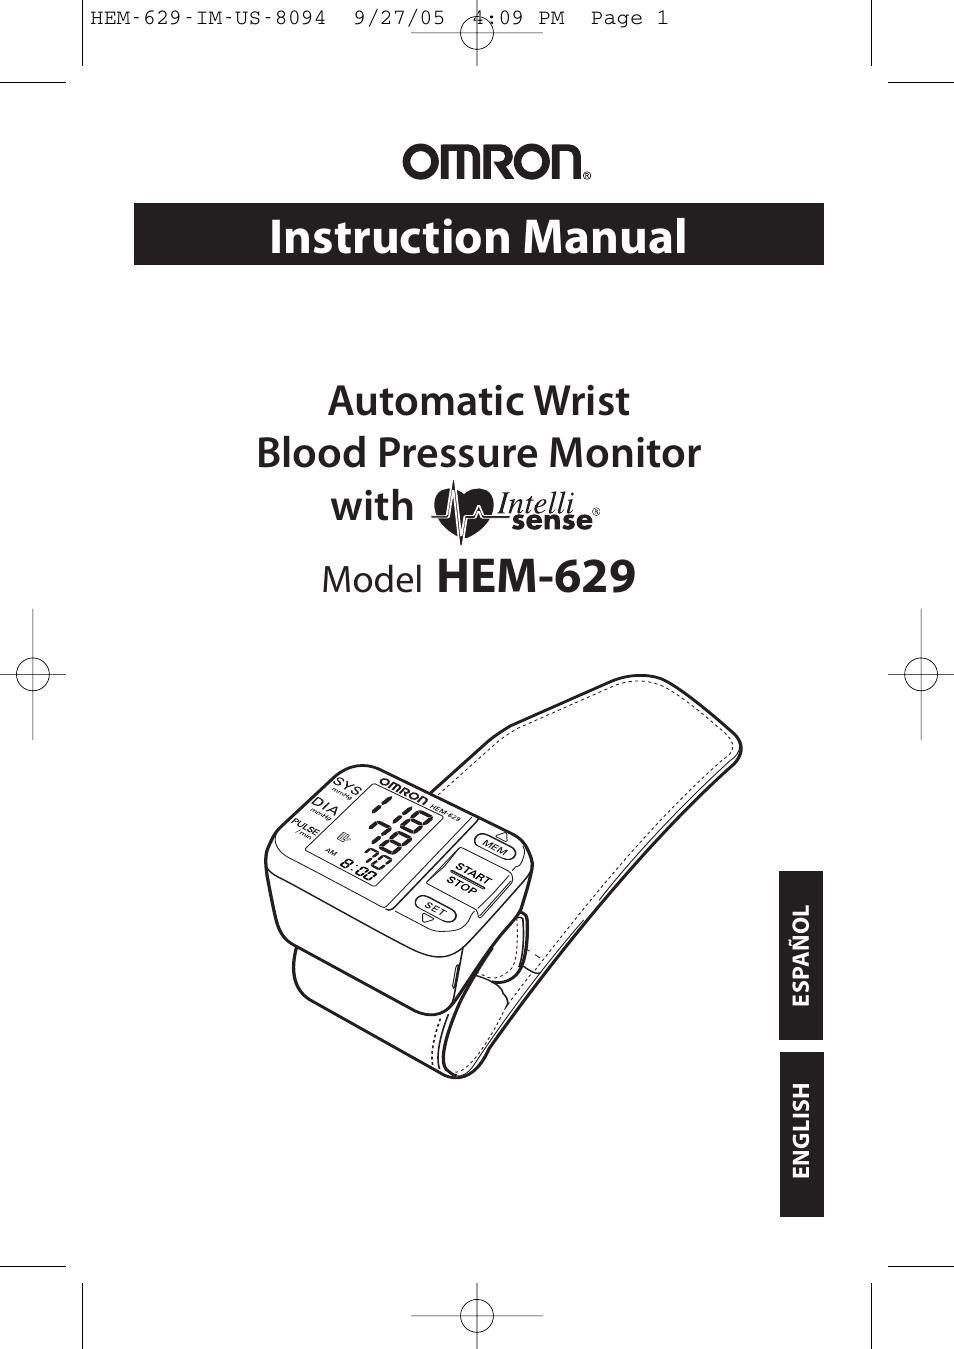 Omron hem-629 instruction manual pdf download.